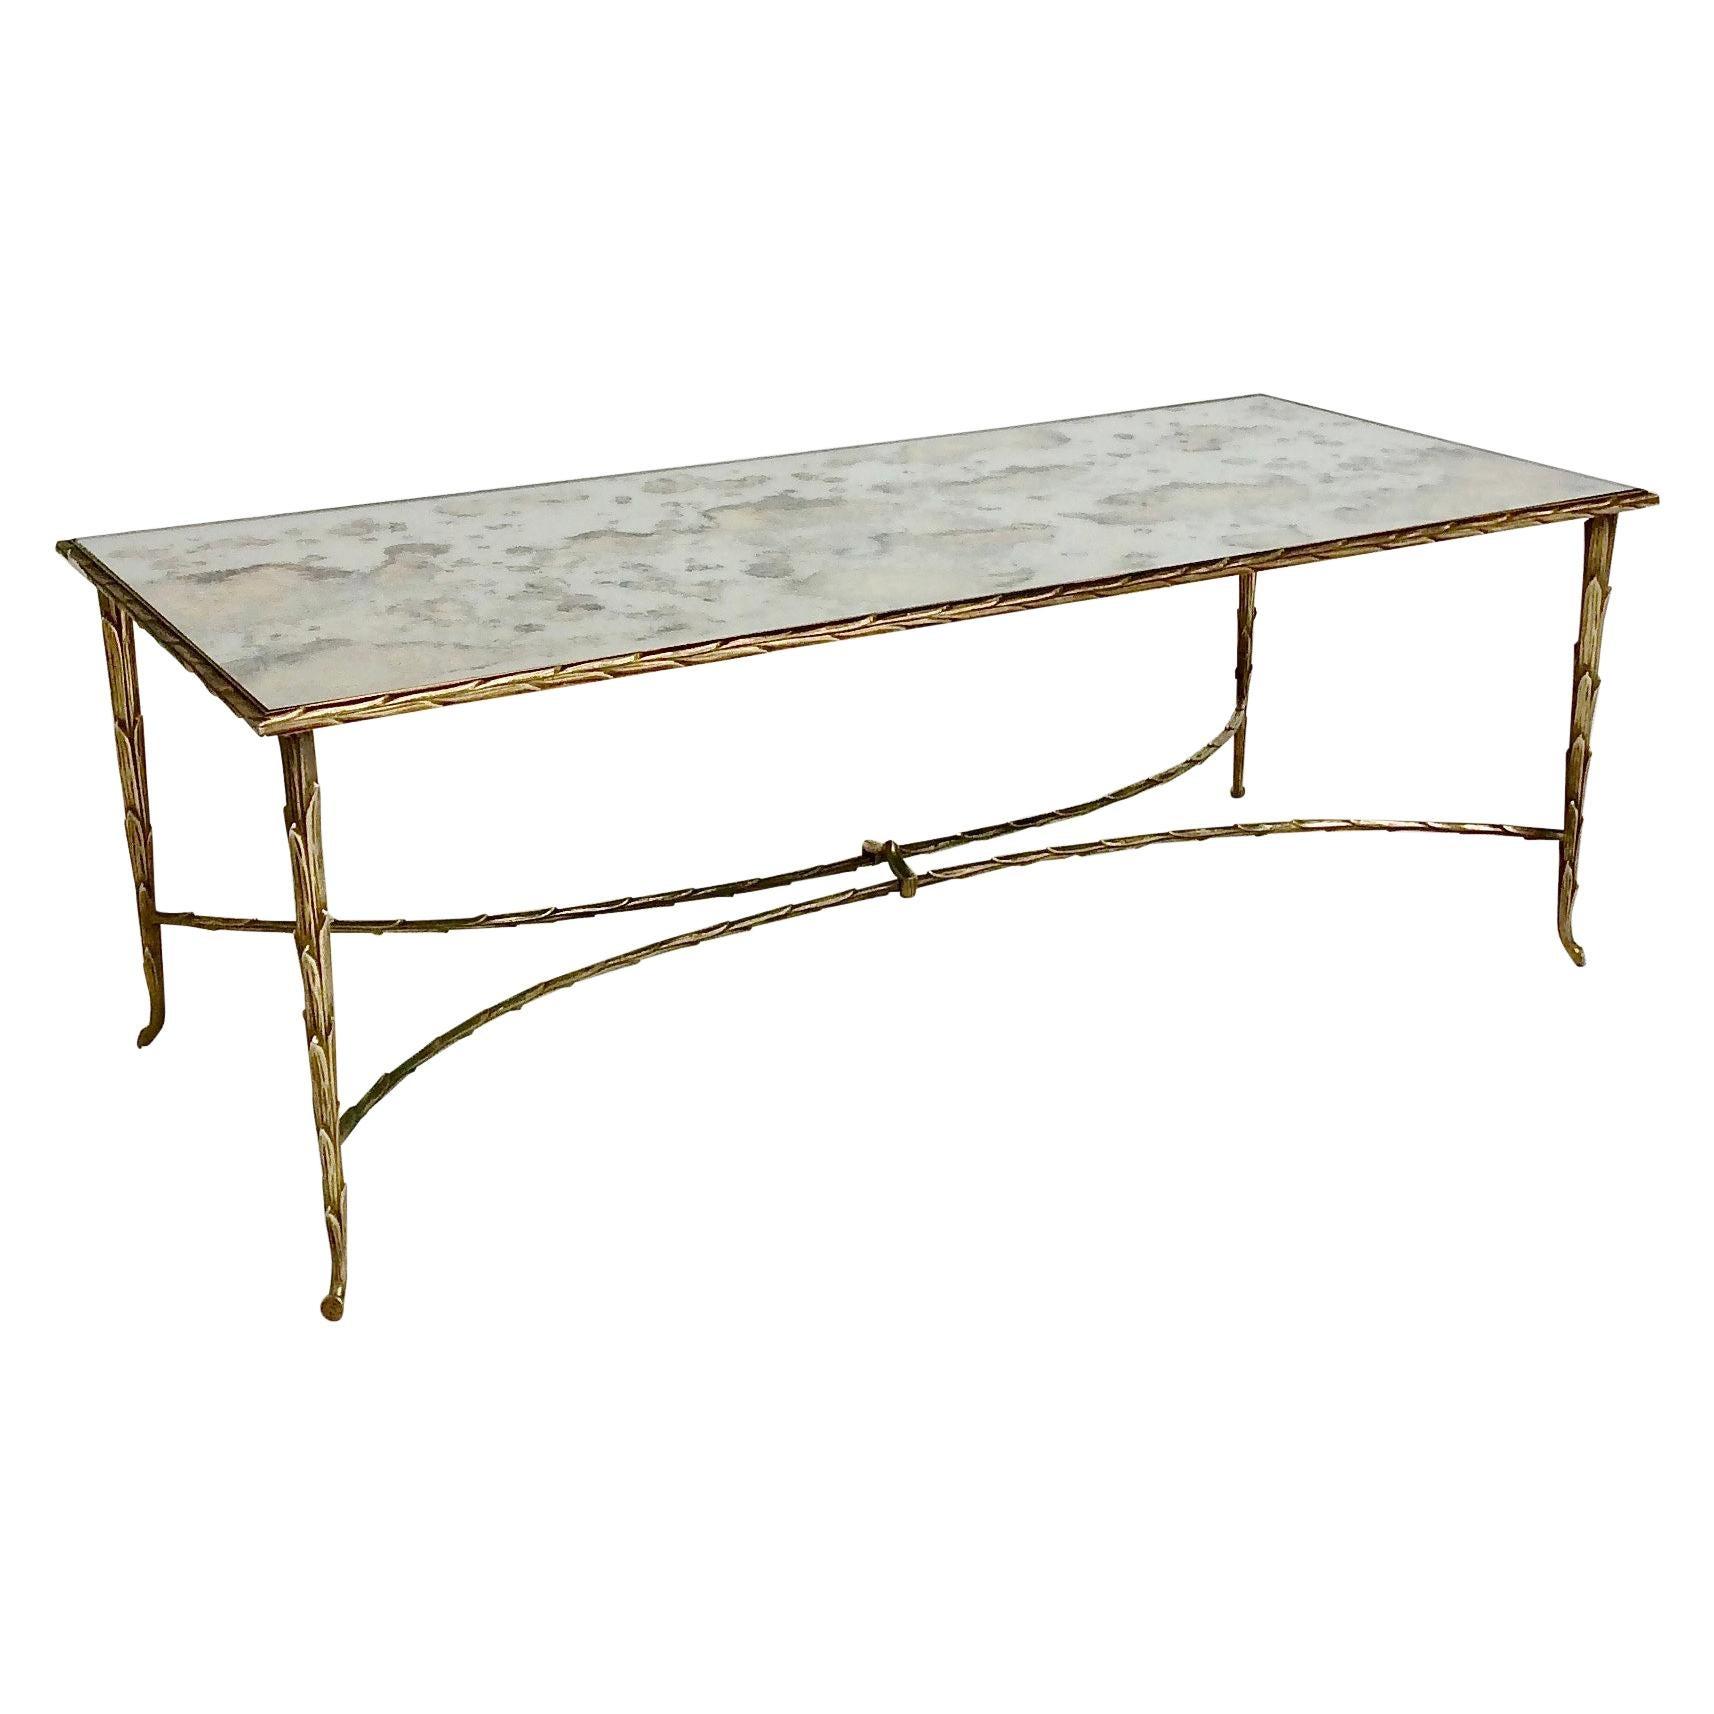 Maison Charles Gilt Bronze Coffee Table, circa 1950, France